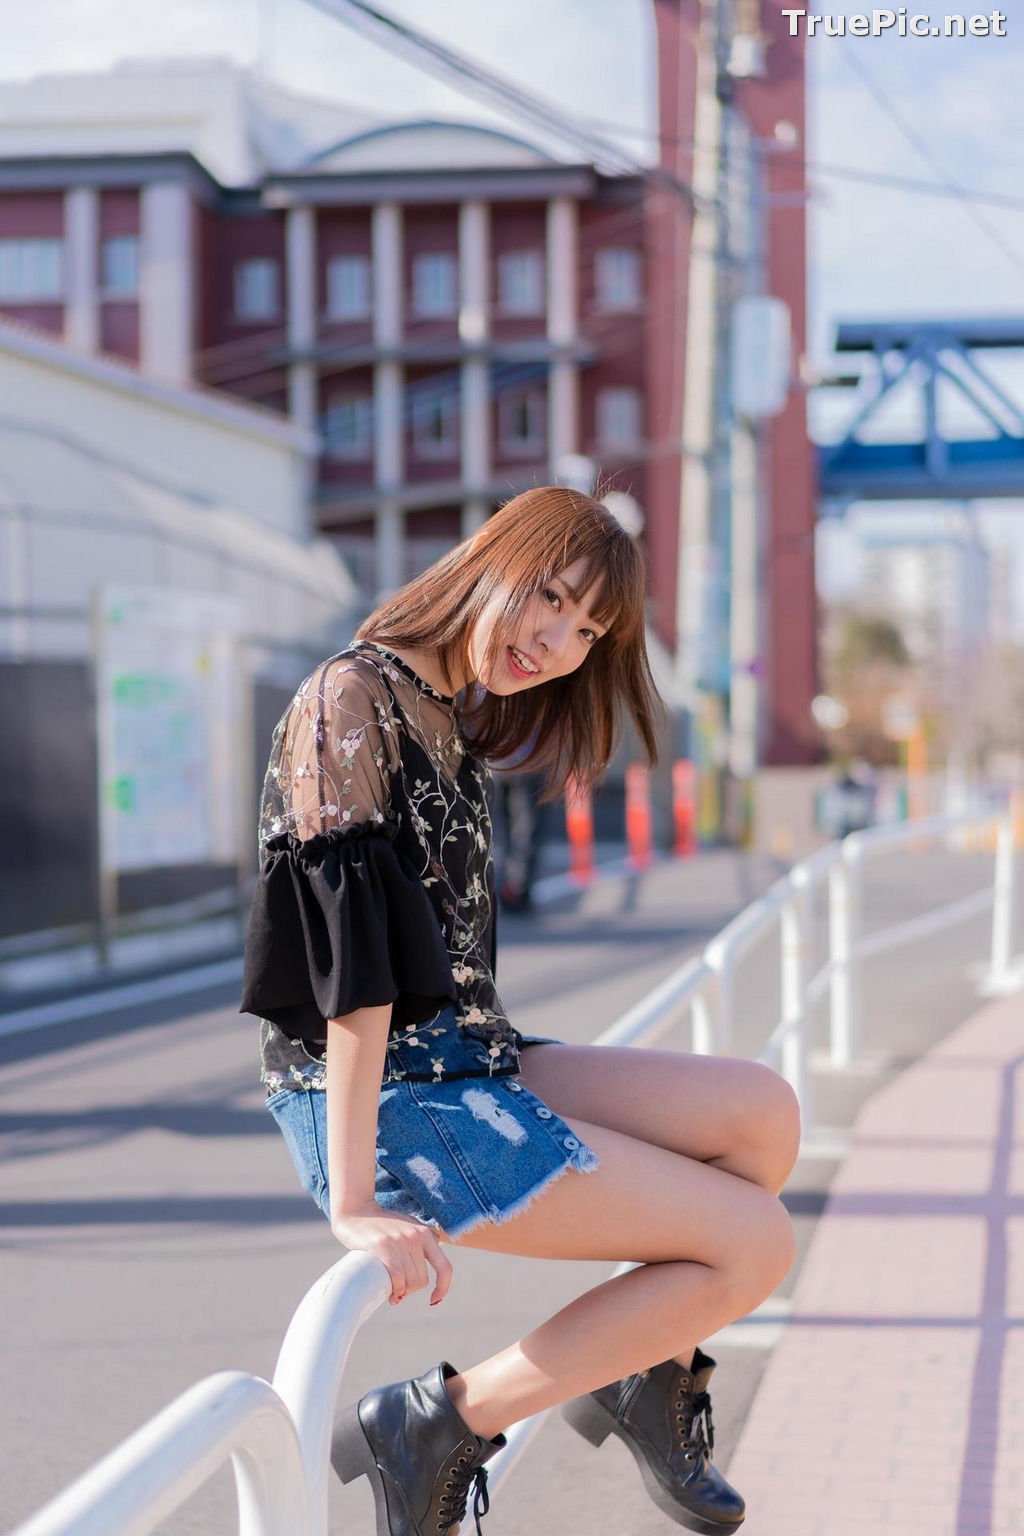 Image Moment Vol.001 - Japanese Gravure Idol - Sayuki 紗雪 Photobook - TruePic.net - Picture-3